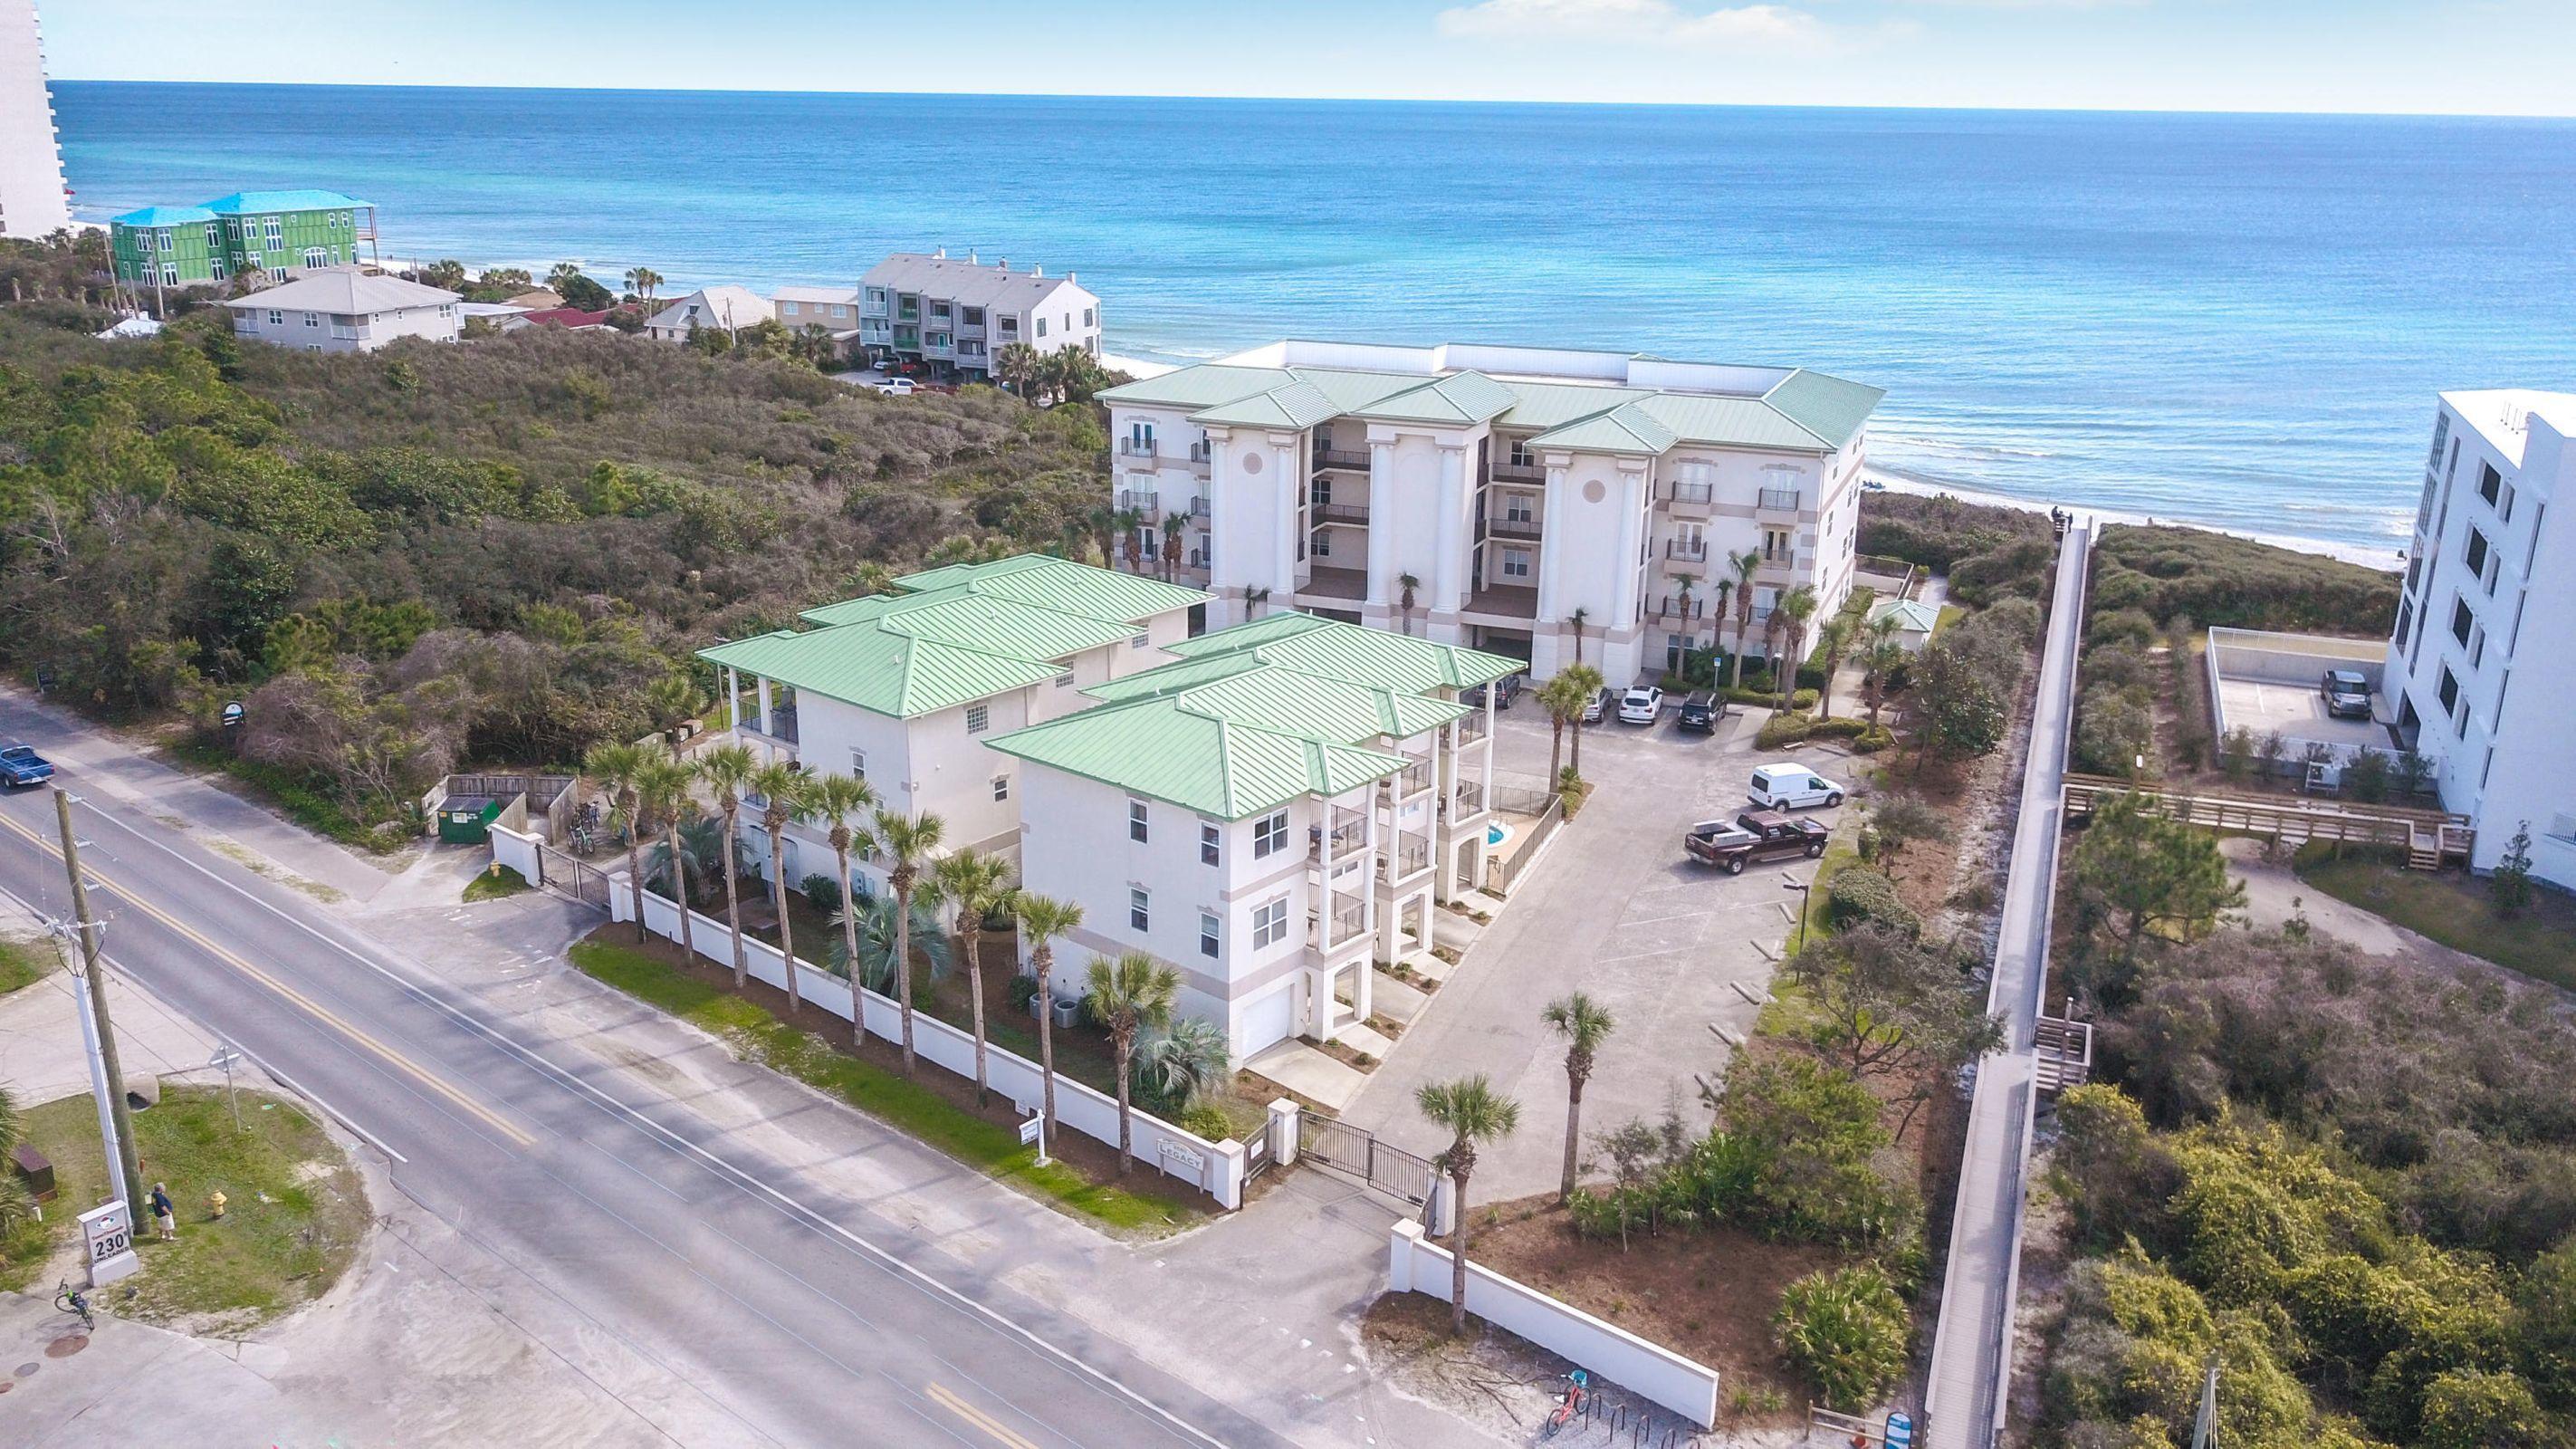 3880 E County Highway 30A 506, Santa Rosa Beach, FL 32459